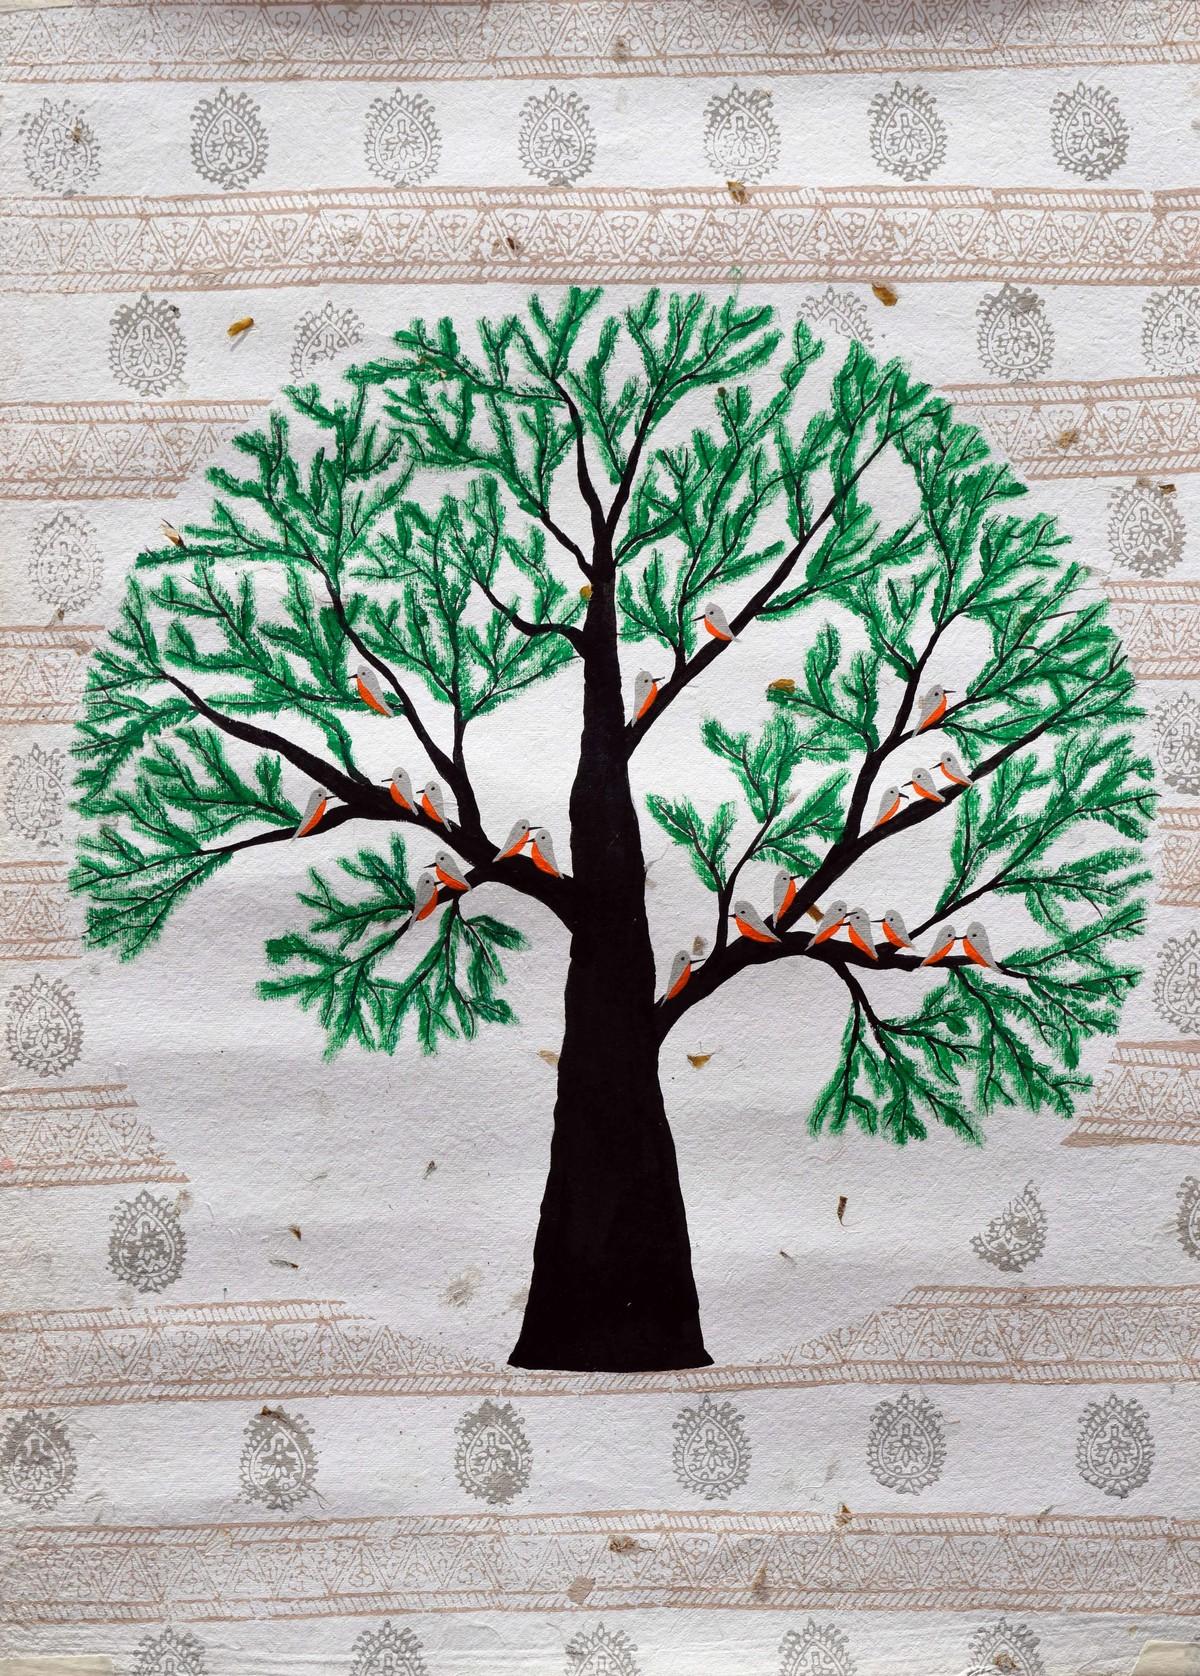 Ataravar Digital Print by Sumit Mehndiratta,Decorative